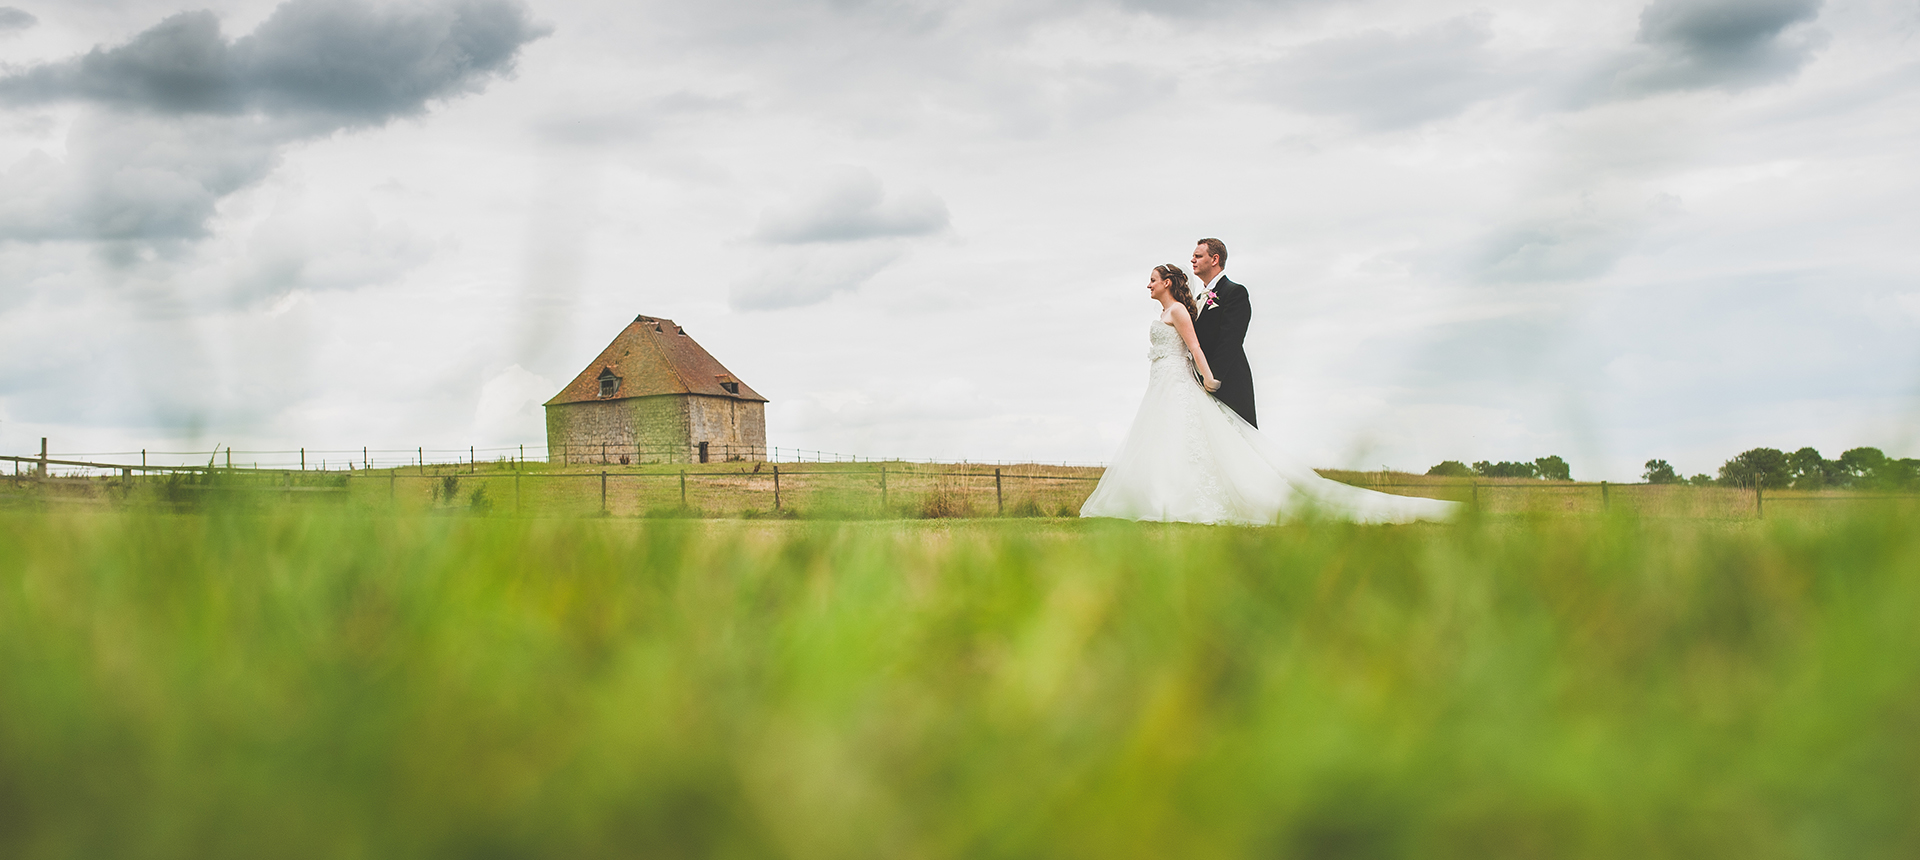 Jenifer-Andrew-wedding-Notley-tythe-barn-11991